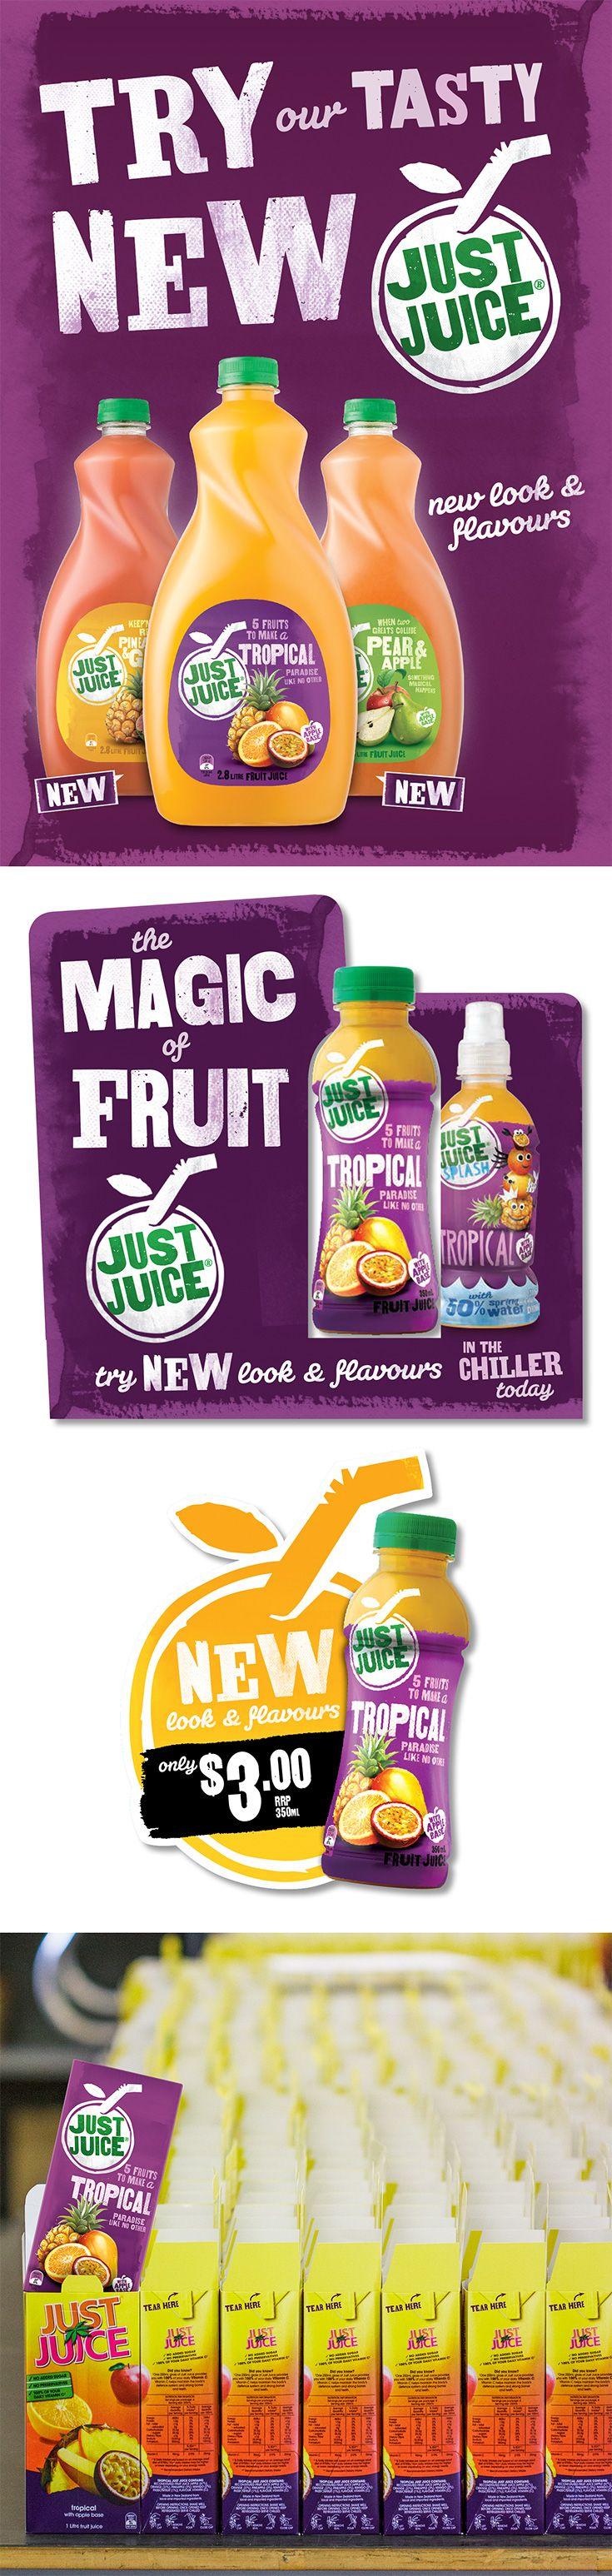 Just Juice Rebrand. Poster, Countertop Glorifier, Fridge Decal and Trade Presenter.